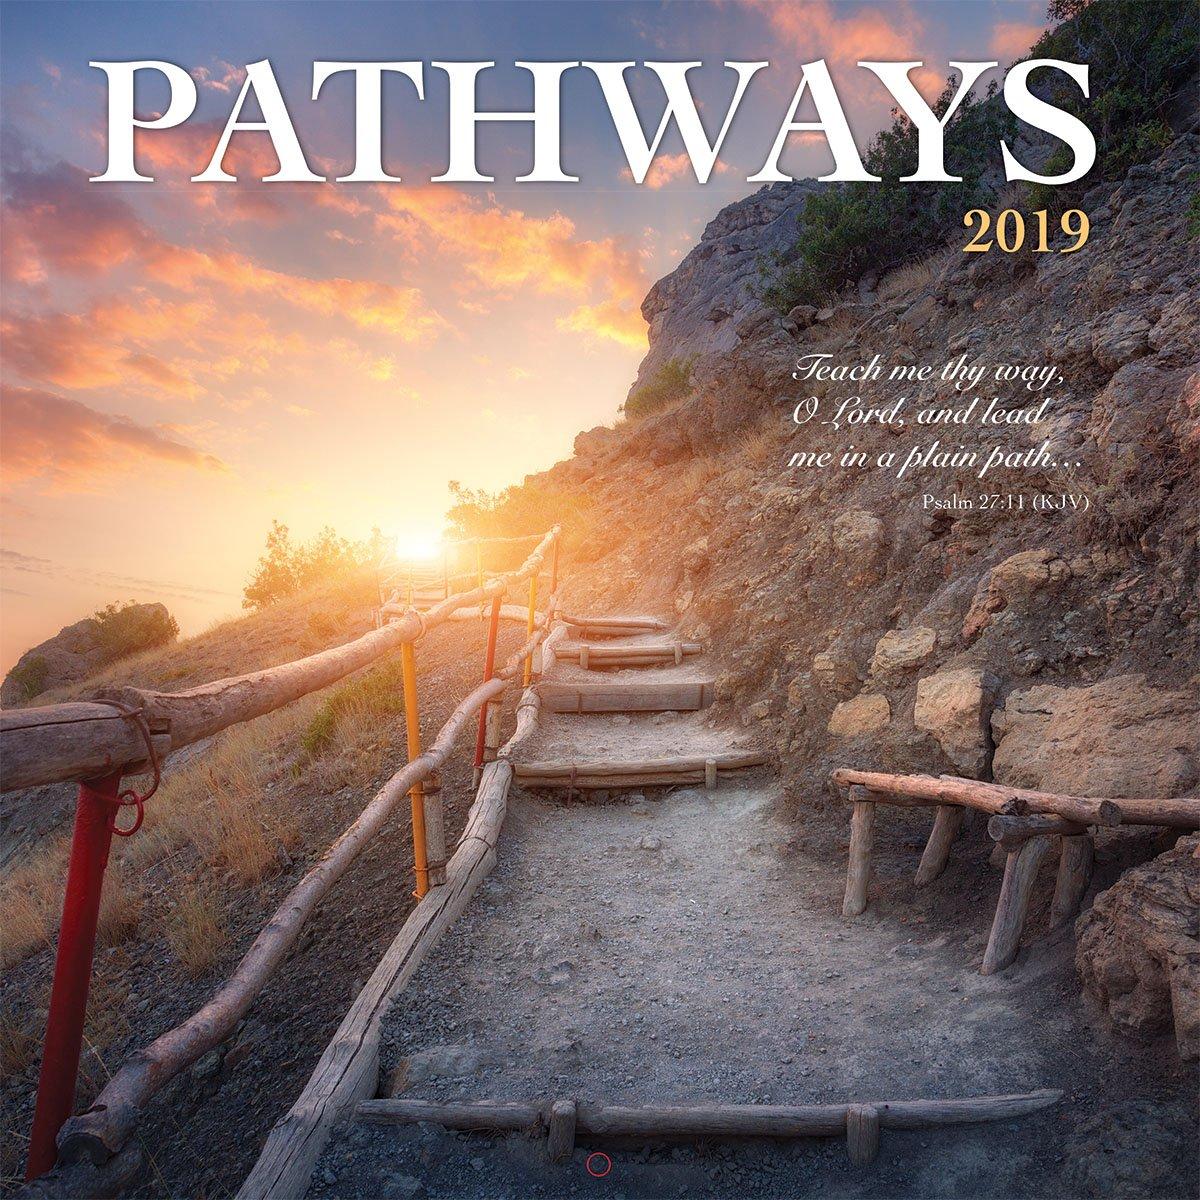 Turner Photo Pathways 2019 Wall Calendar (199989400420 Office Wall Calendar (19998940042)